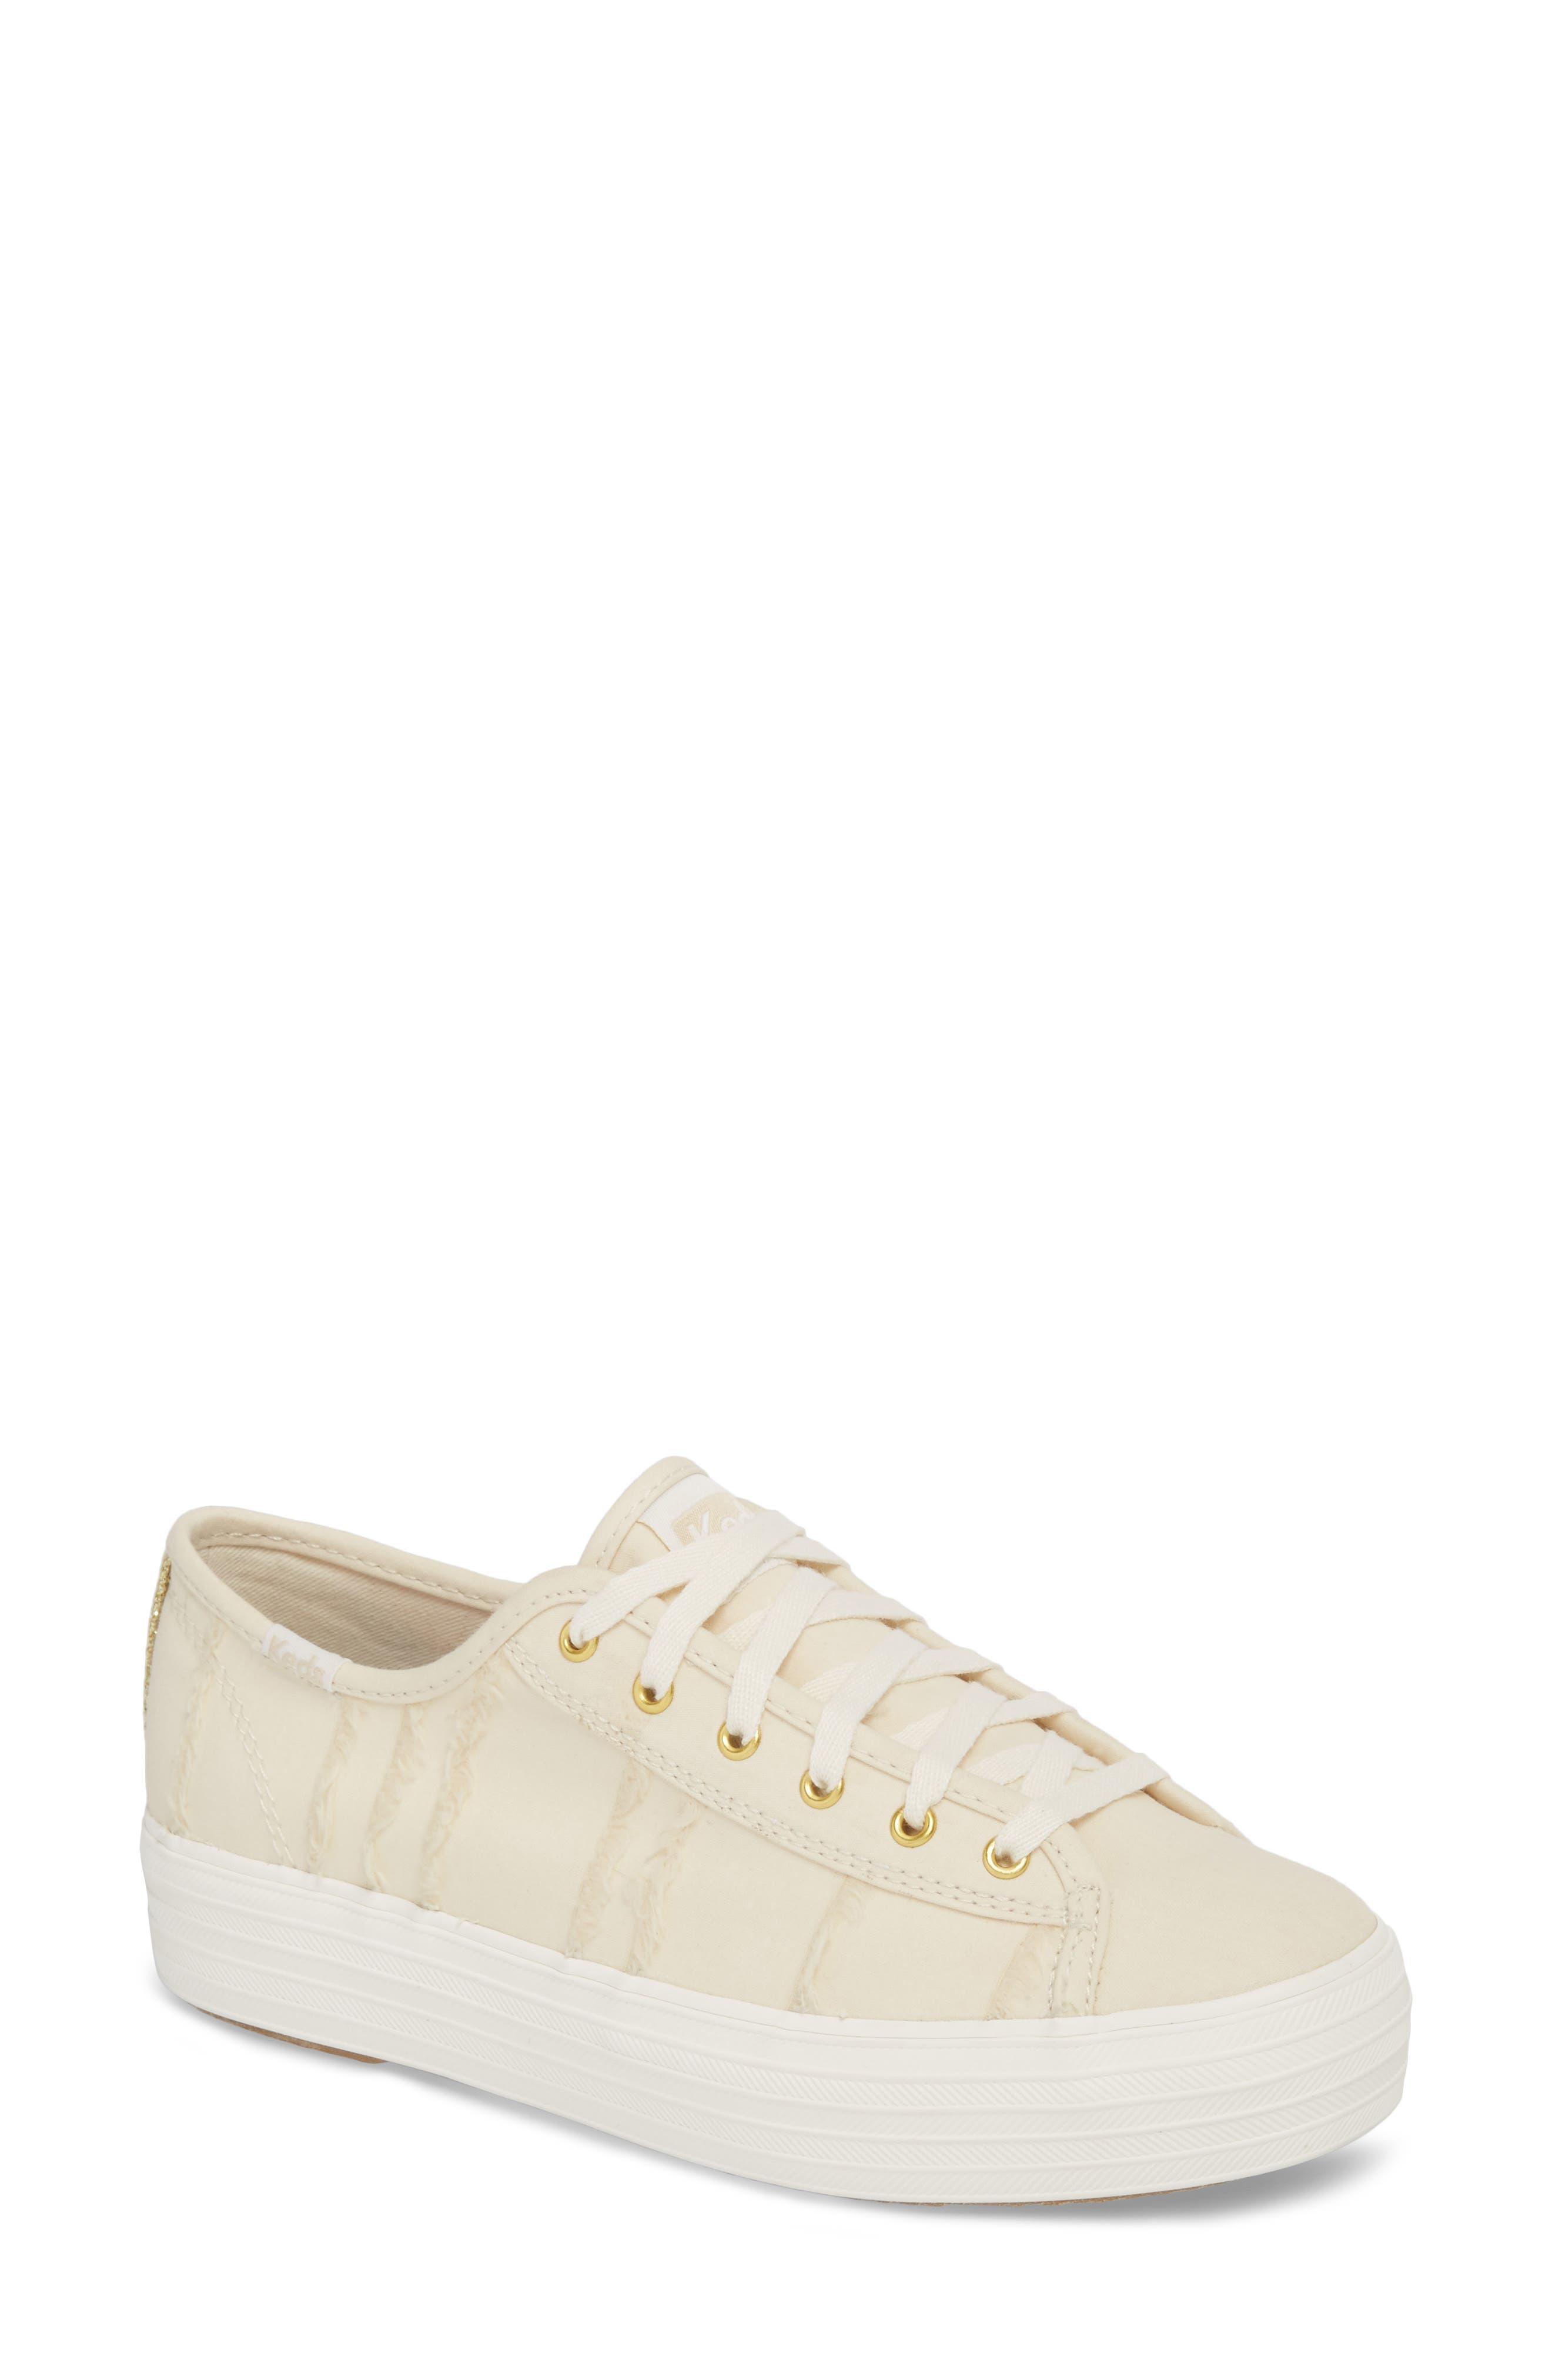 Triple Kick Canvas Sneaker,                         Main,                         color, Cream